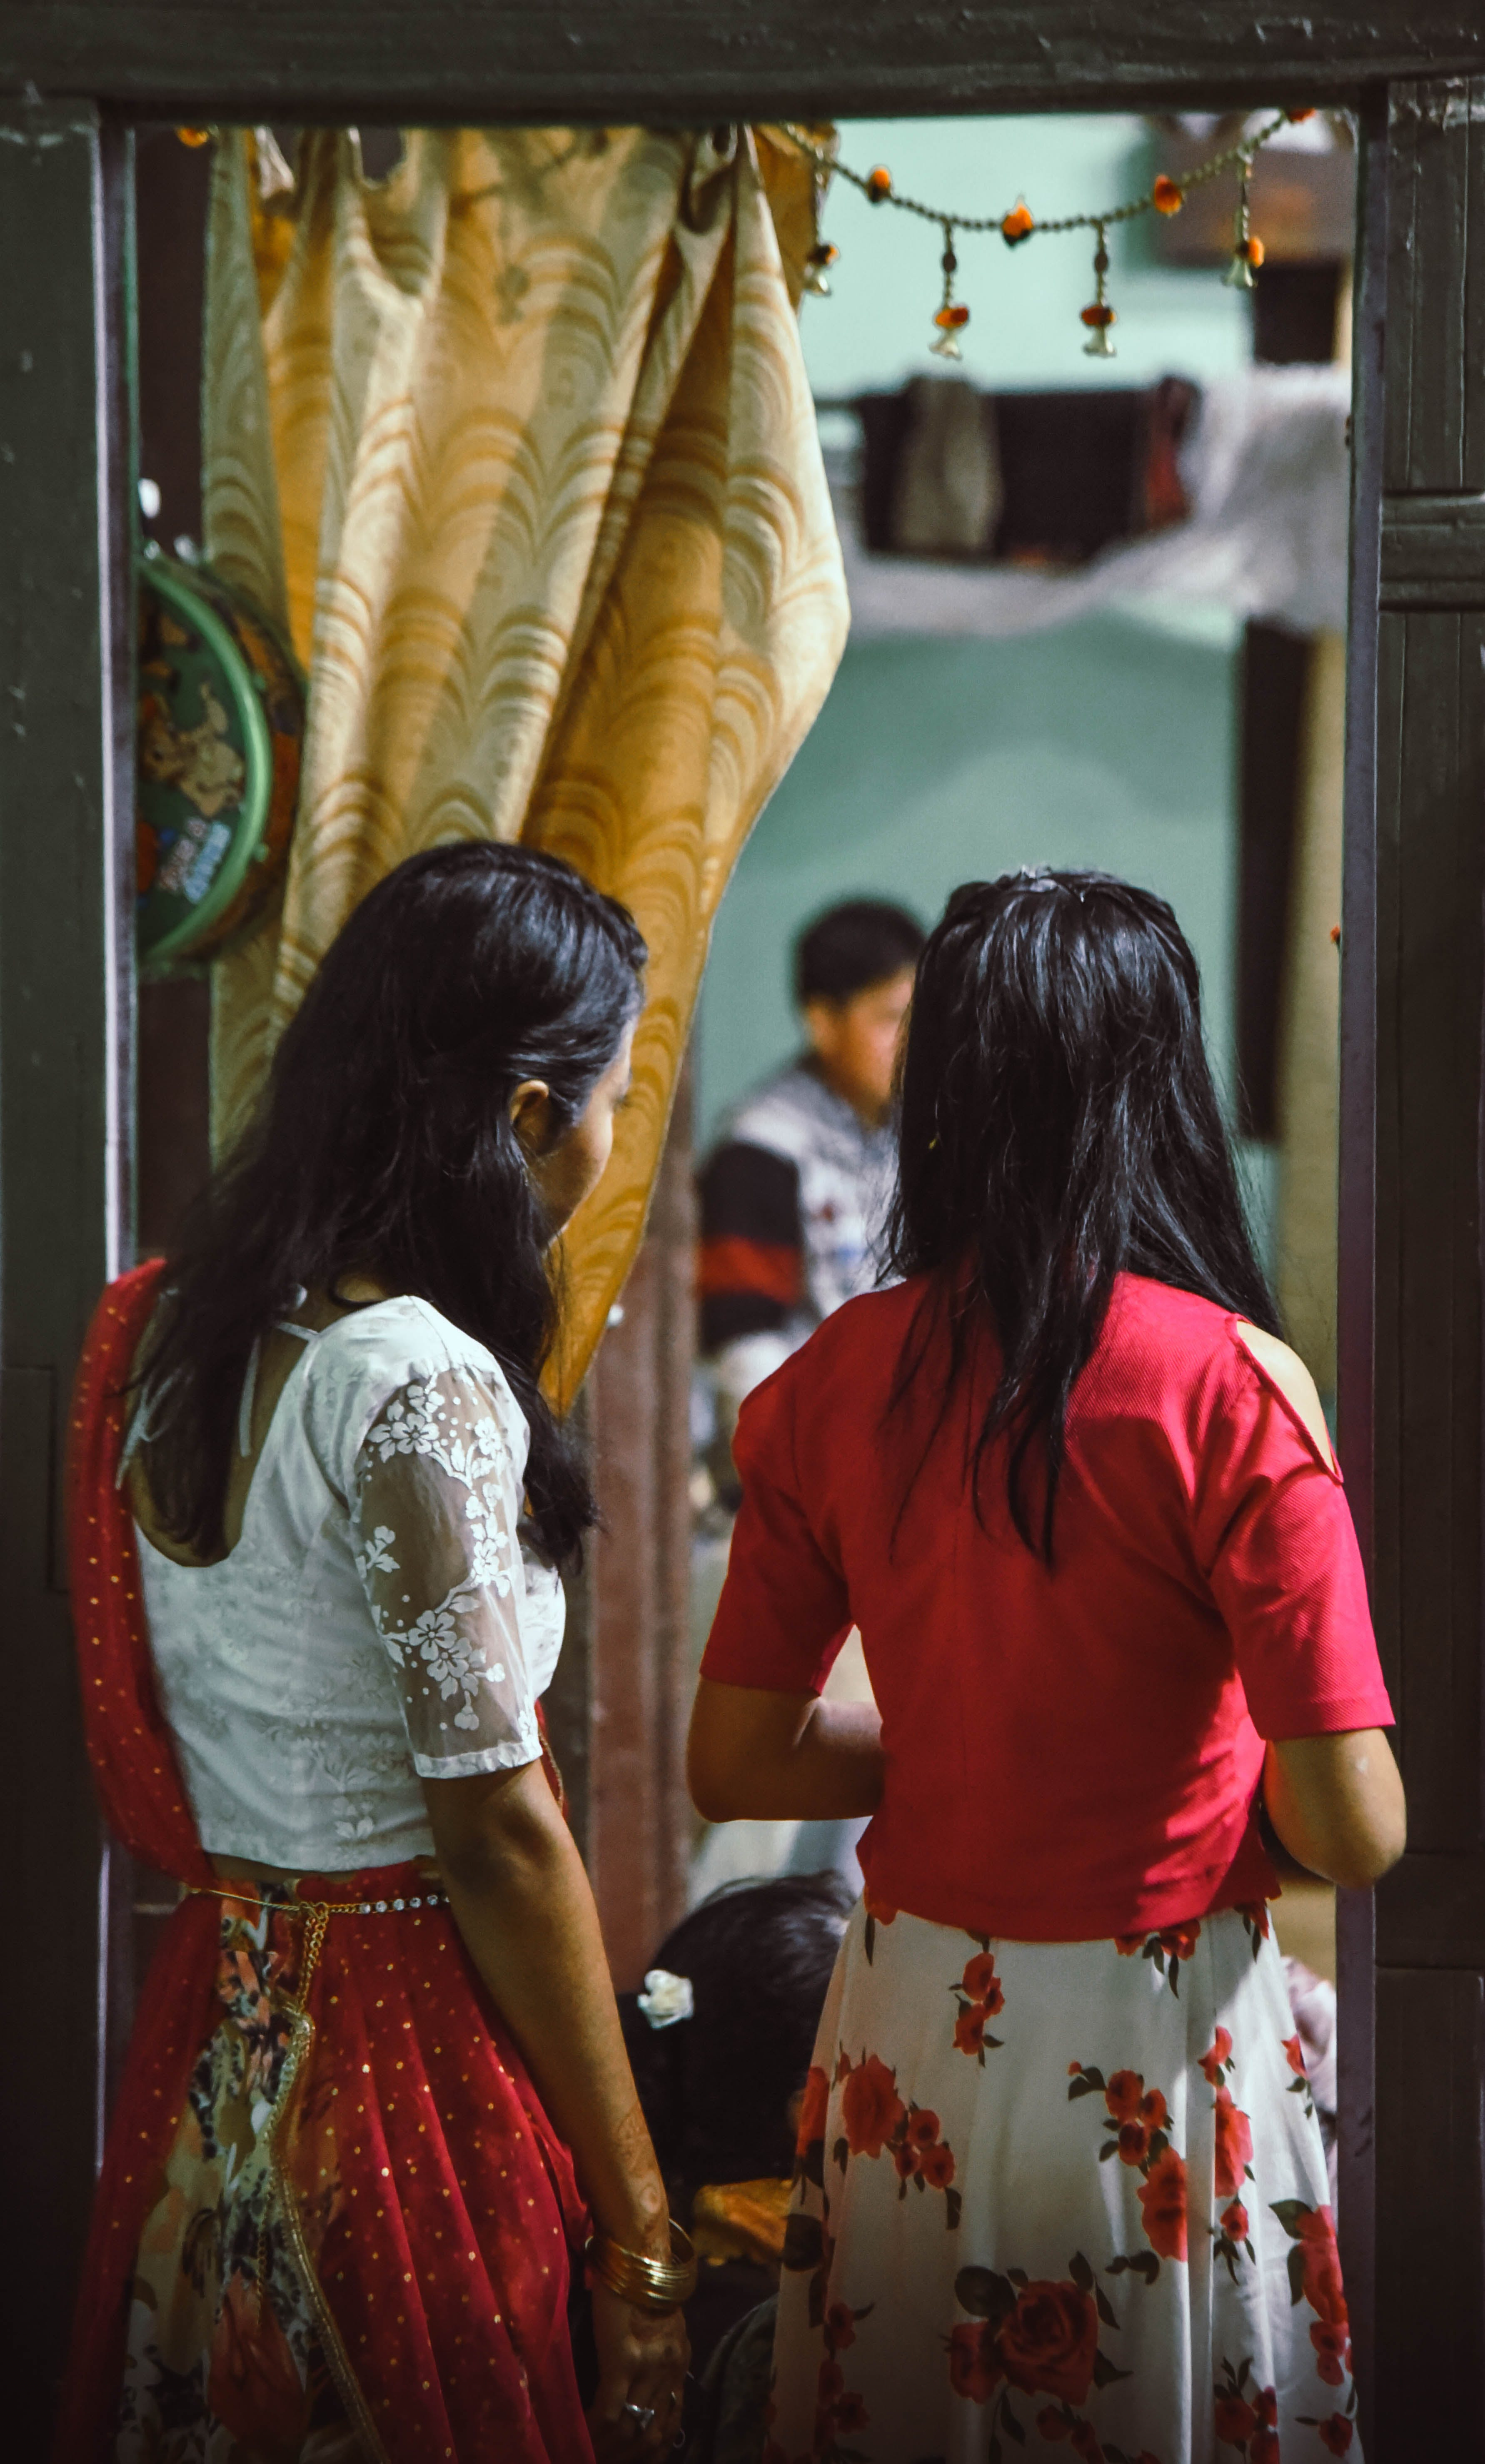 Free stock photo of asian girls, looking away, wedding